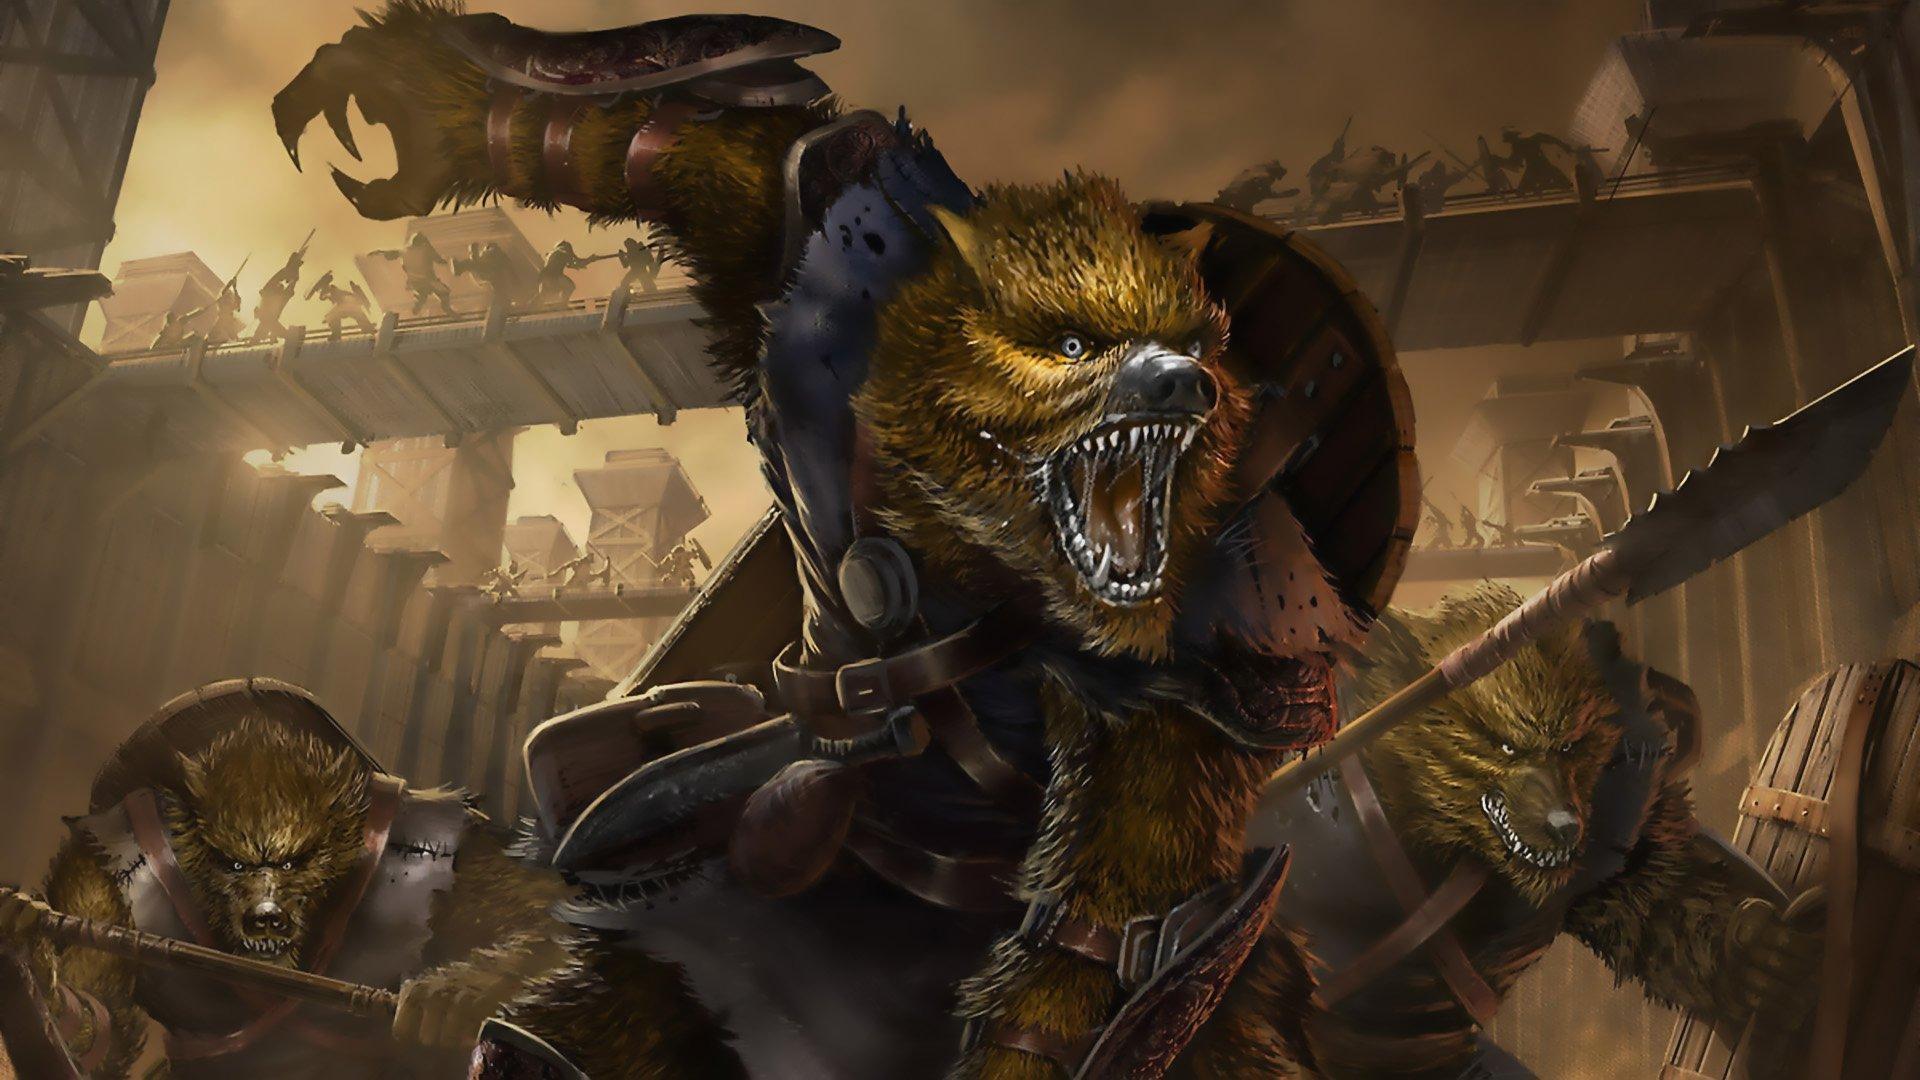 wallpaper.wiki-Download-Free-Werewolf-Wallpaper-PIC-WPD00152